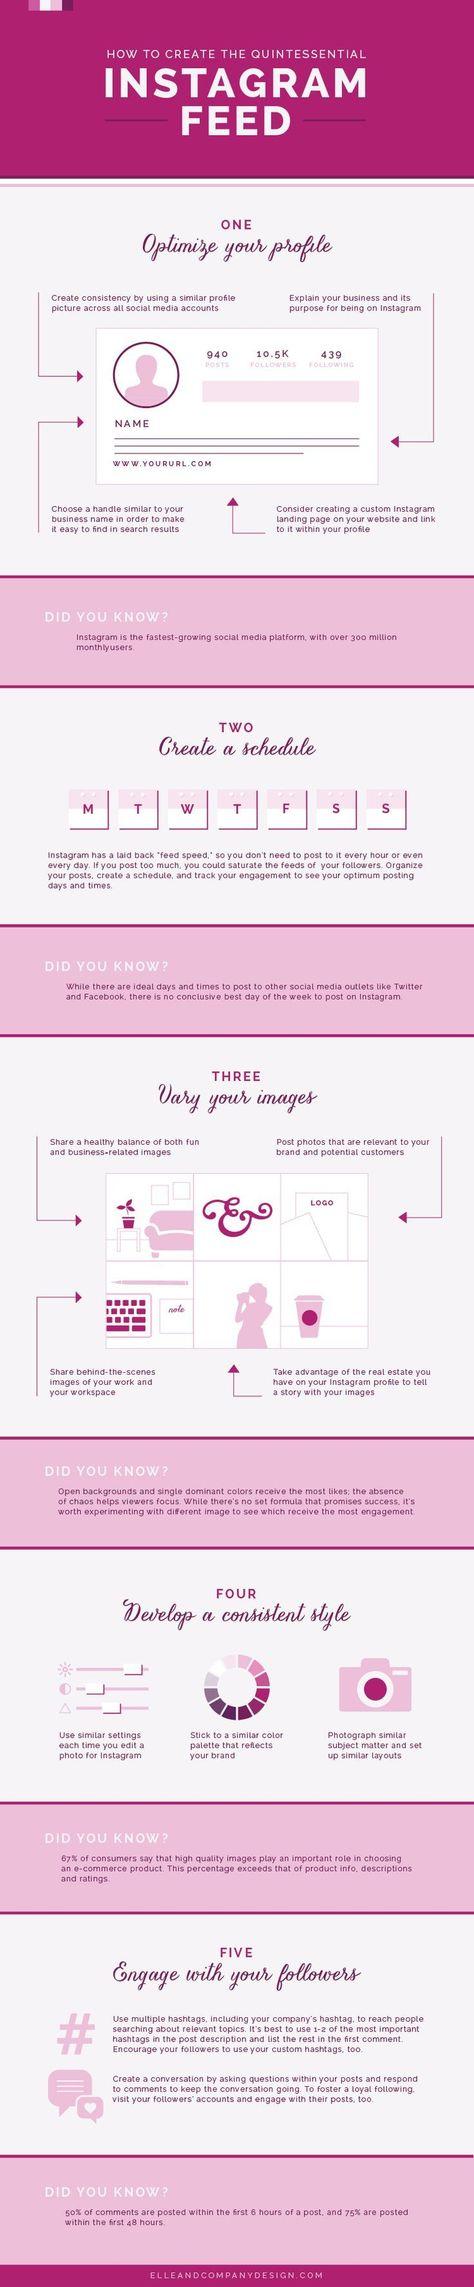 Photography Instagram Ideas Social Media Tips 65 Trendy Ideas